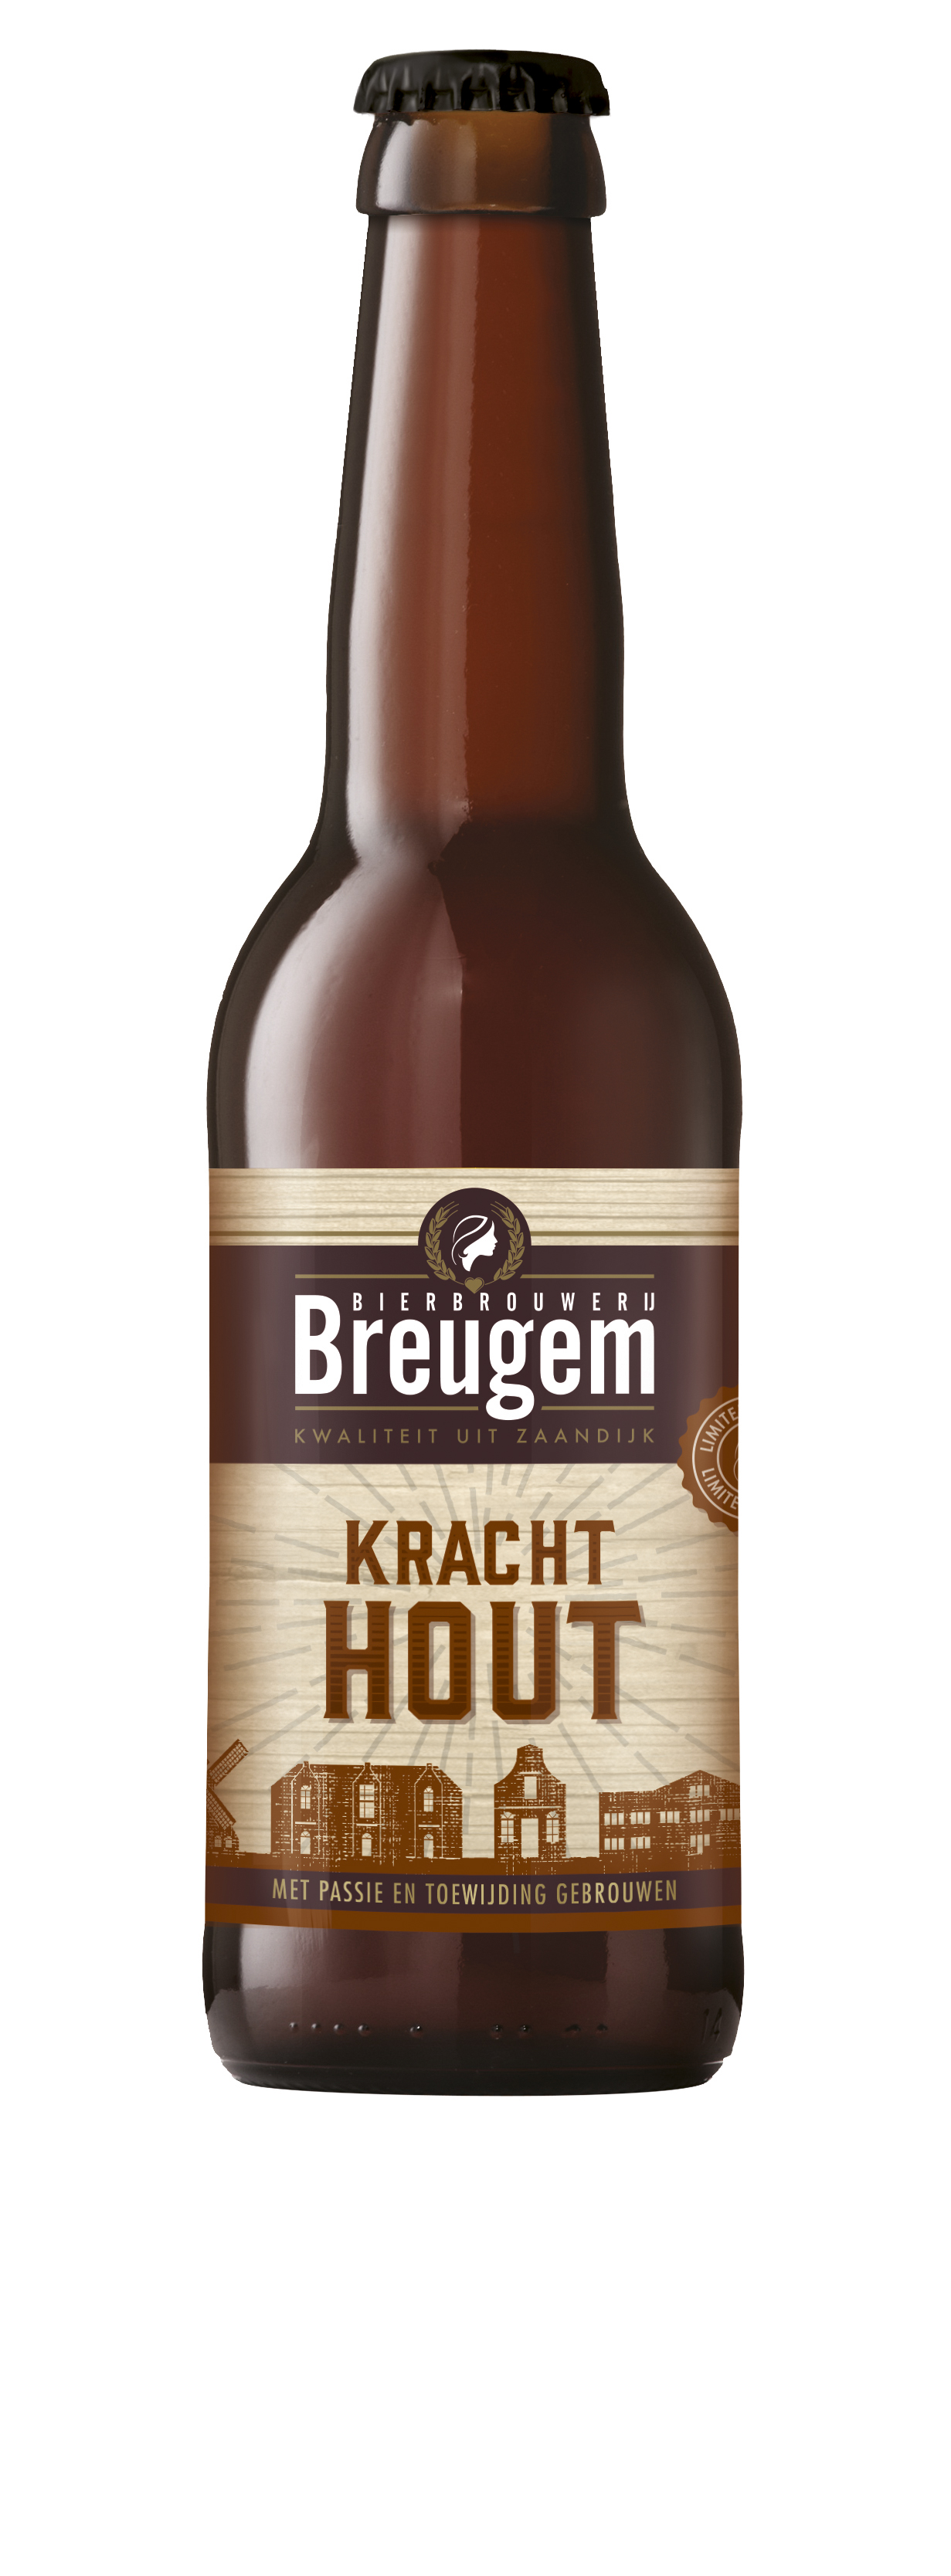 Breugem_Krachthout_300dpi_rgb.jpg